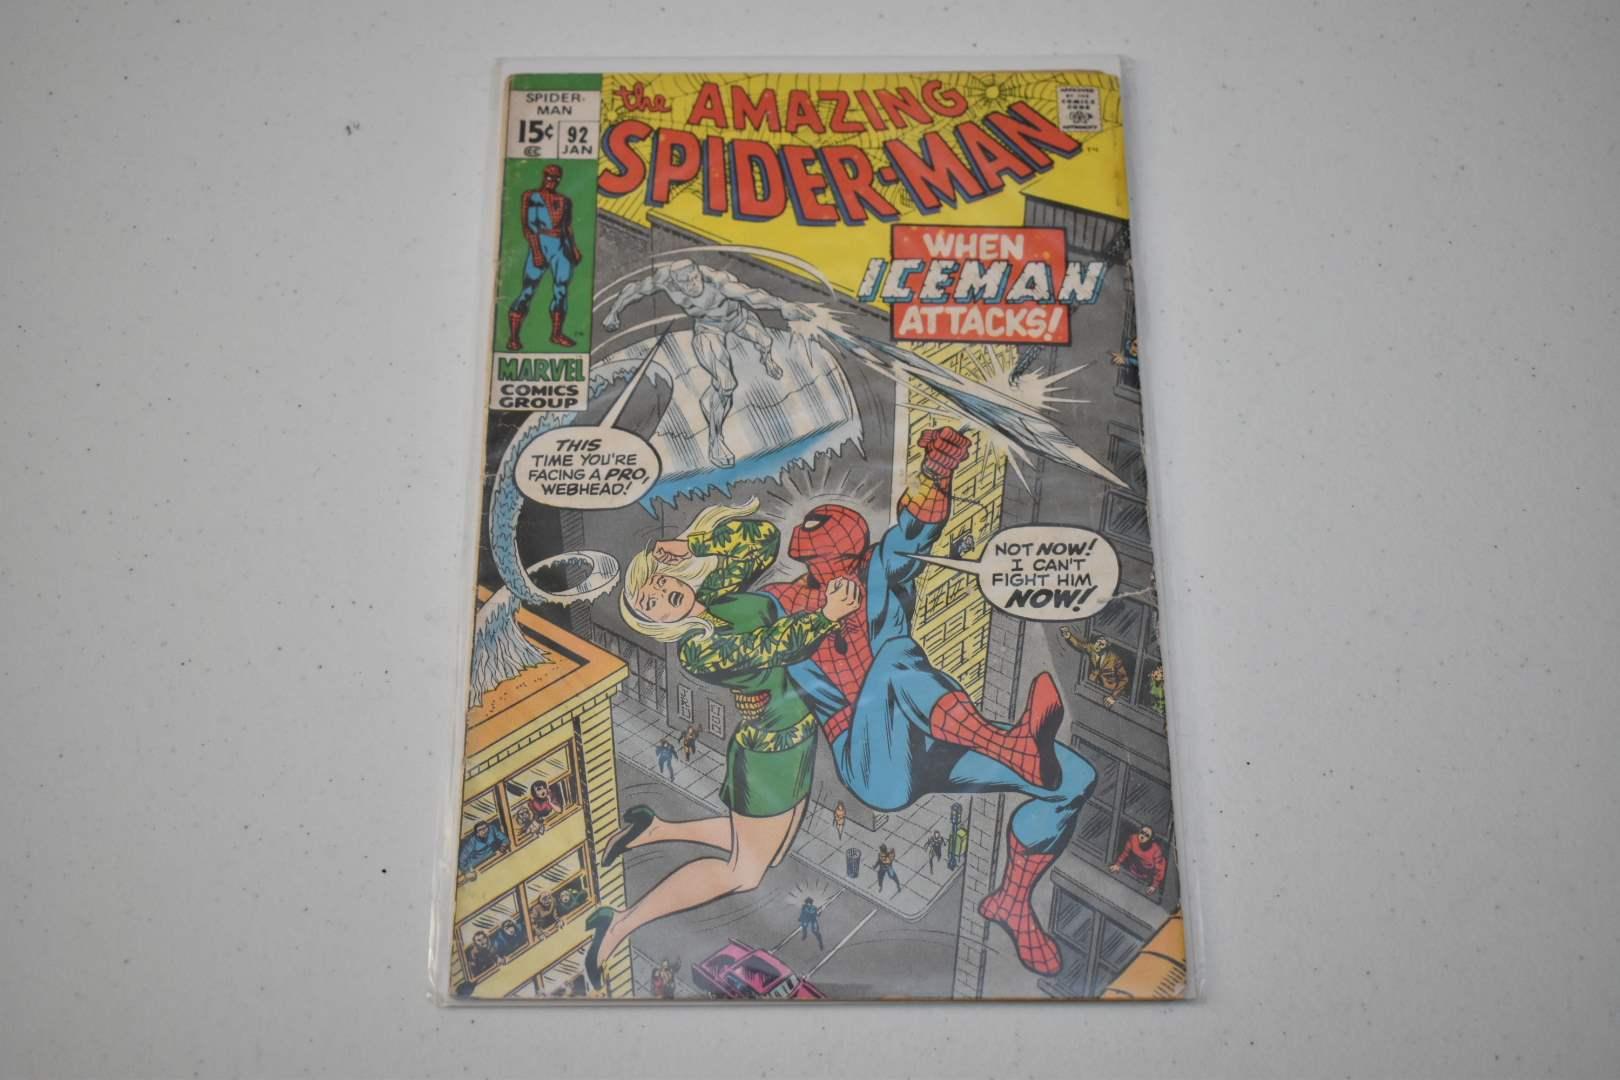 The Amazing Spiderman #92: When Iceman Attacks